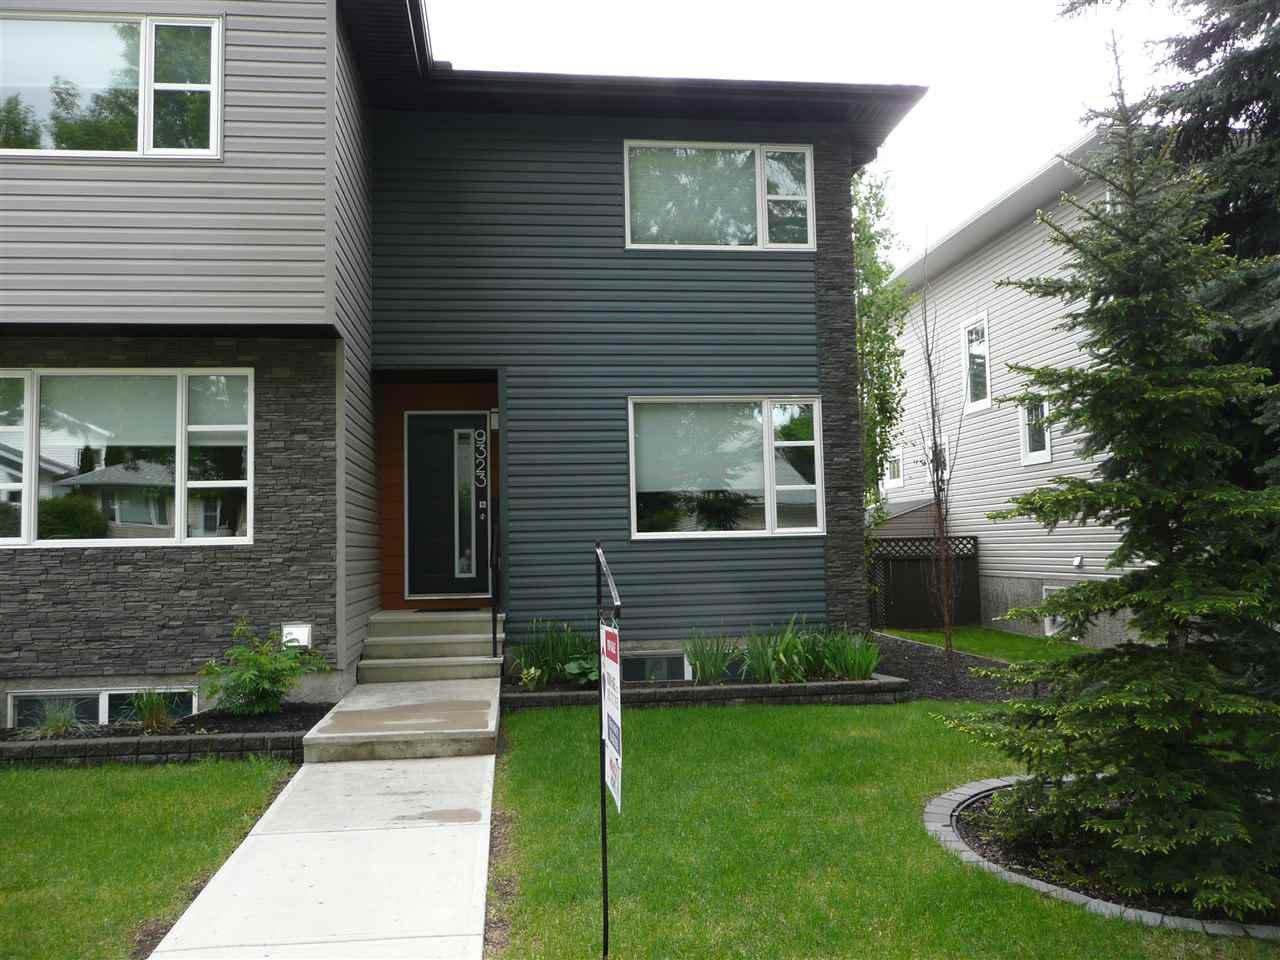 Main Photo: 9323 93 Street NW in Edmonton: Zone 18 House Triplex for sale : MLS®# E4202540